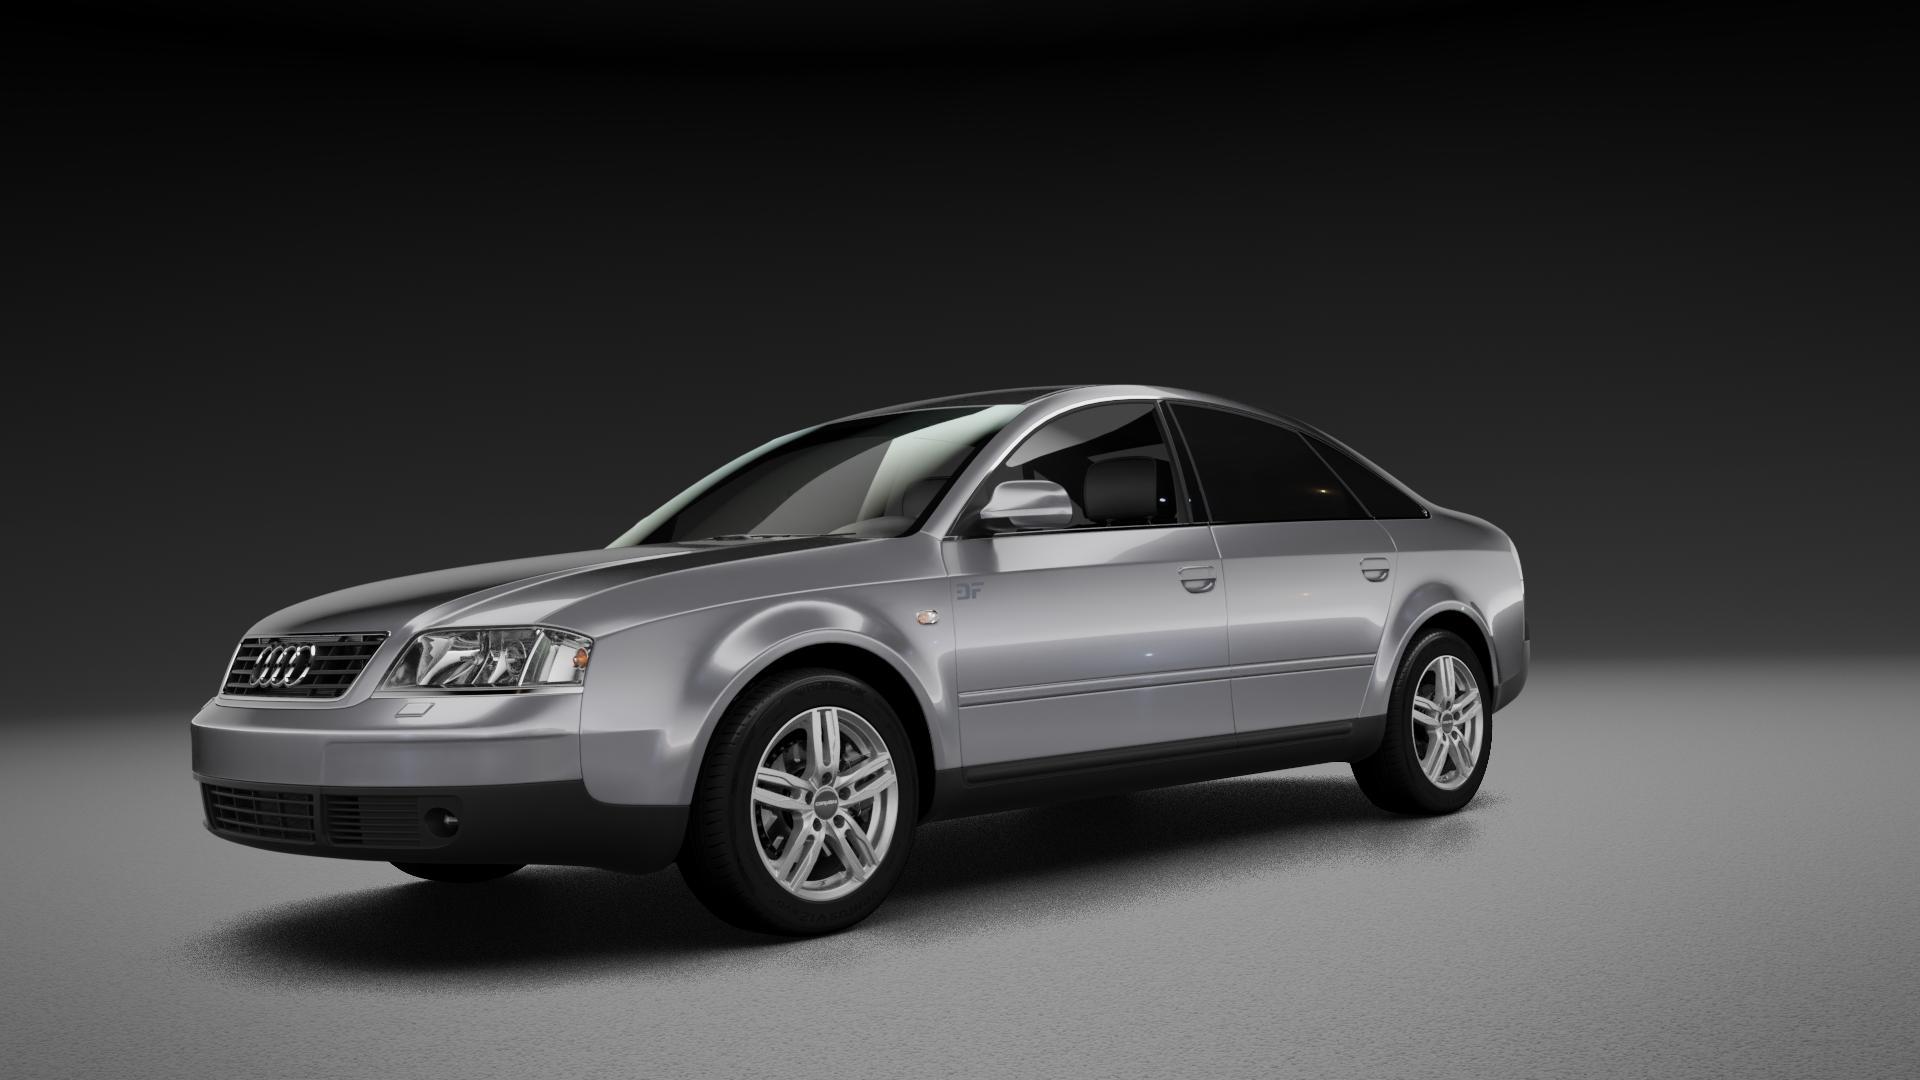 CARMANI 14 Paul kristall silber Felge mit Reifen in 16Zoll Winterfelge Alufelge auf silbernem Audi A6 Typ 4B/C5 (Limousine) ⬇️ mit 15mm Tieferlegung ⬇️ Neutral_mid_max5300mm Frontansicht_1